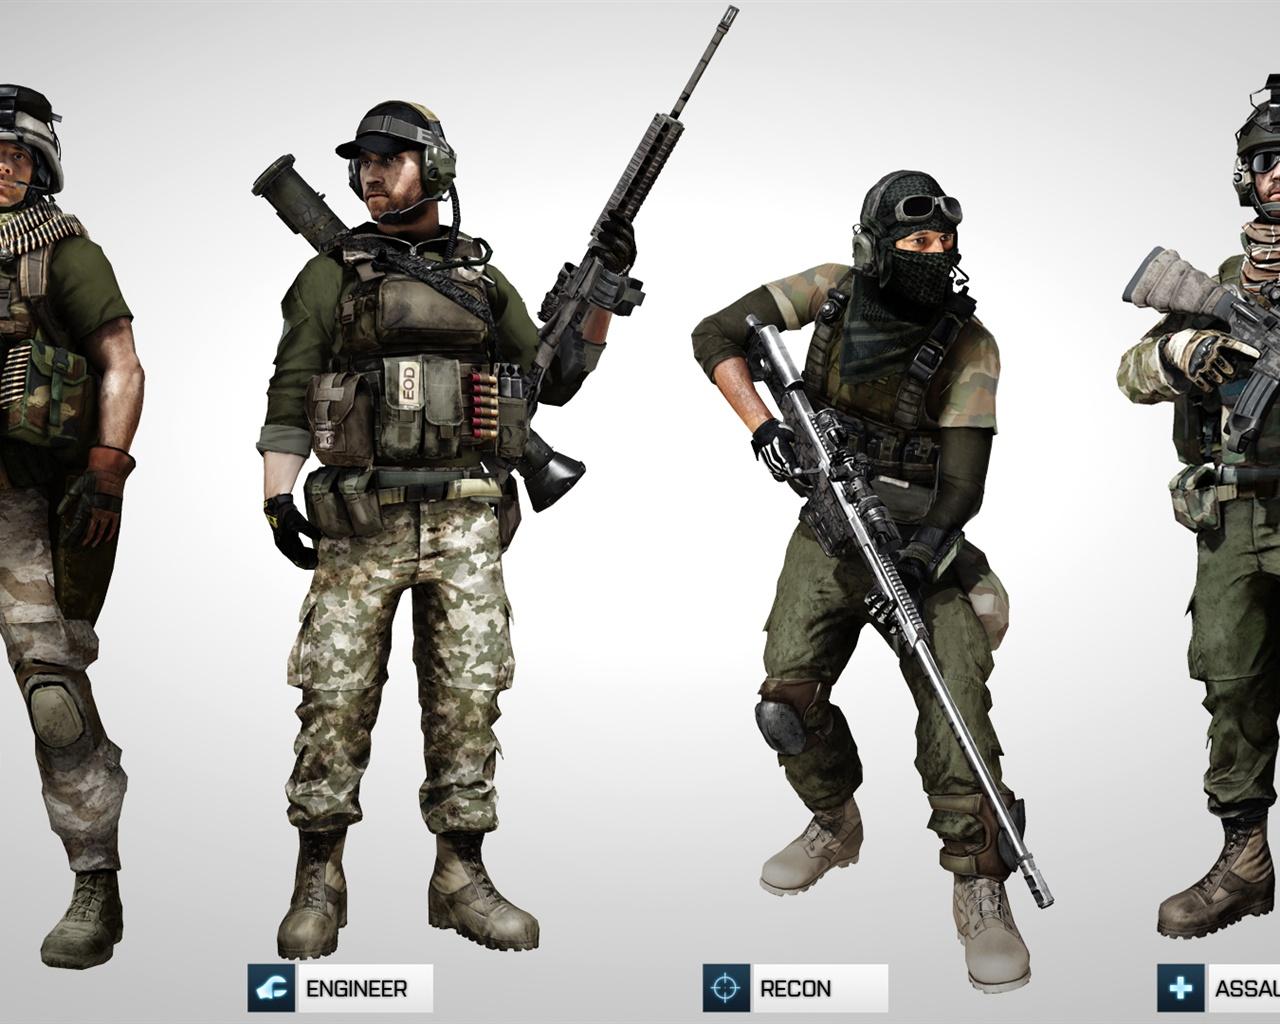 Battlefield 3 Multiplayer game 640x960 iPhone 44S wallpaper 1280x1024